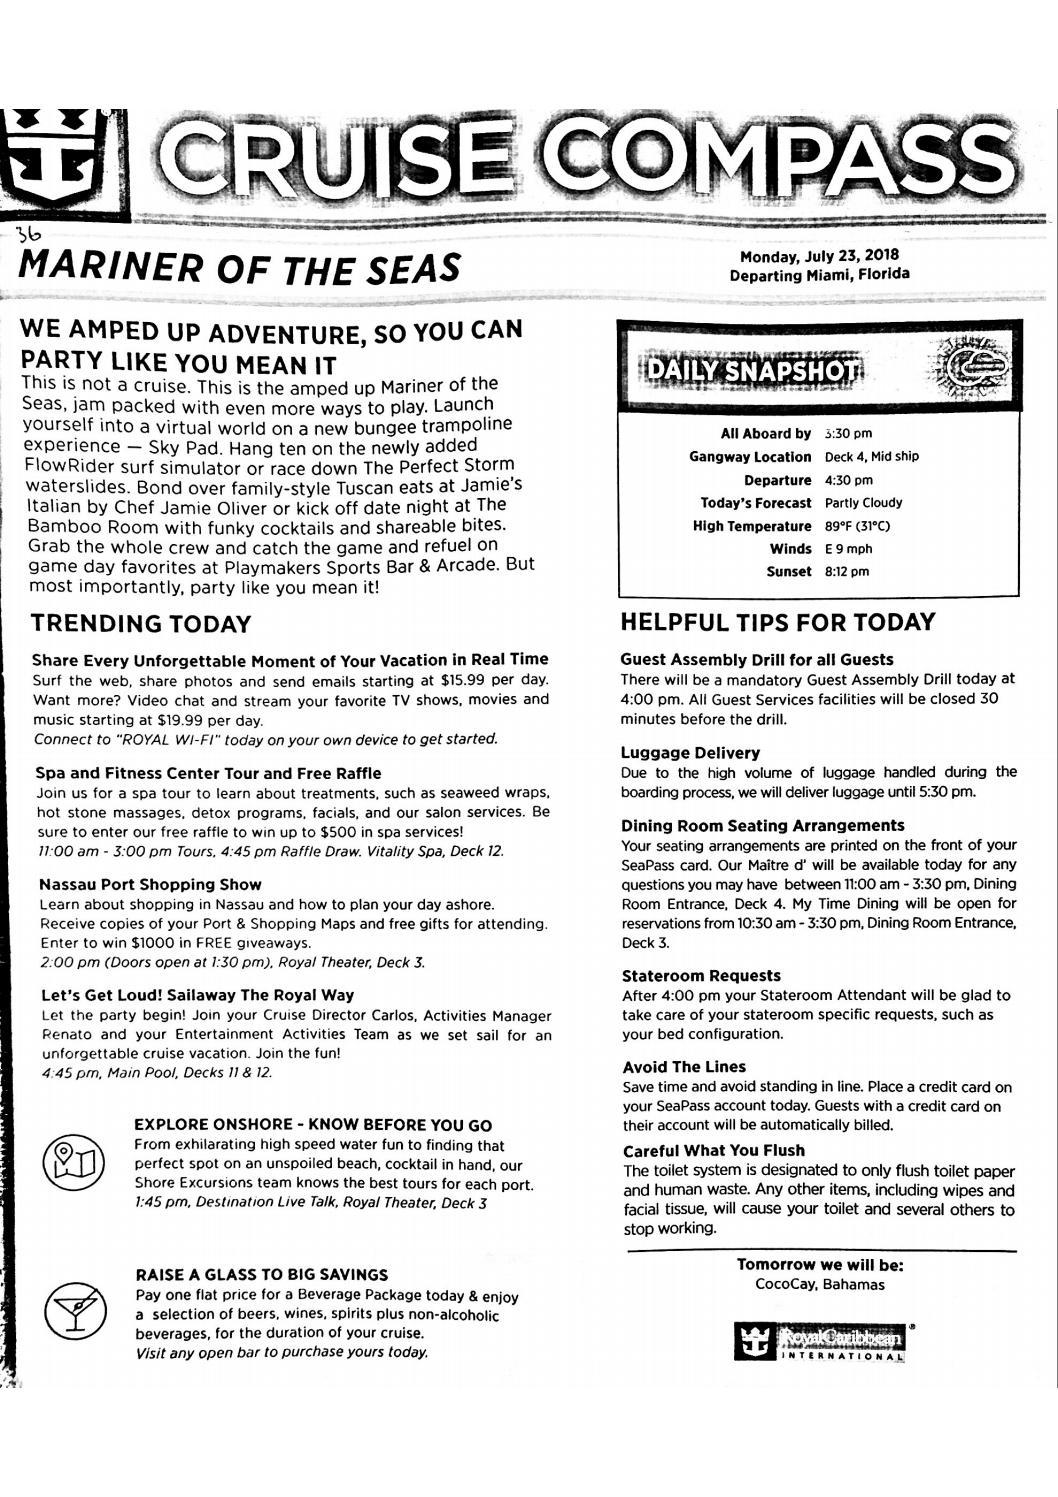 Mariner Of The Seas 4-night Bahamas Cruise Compass